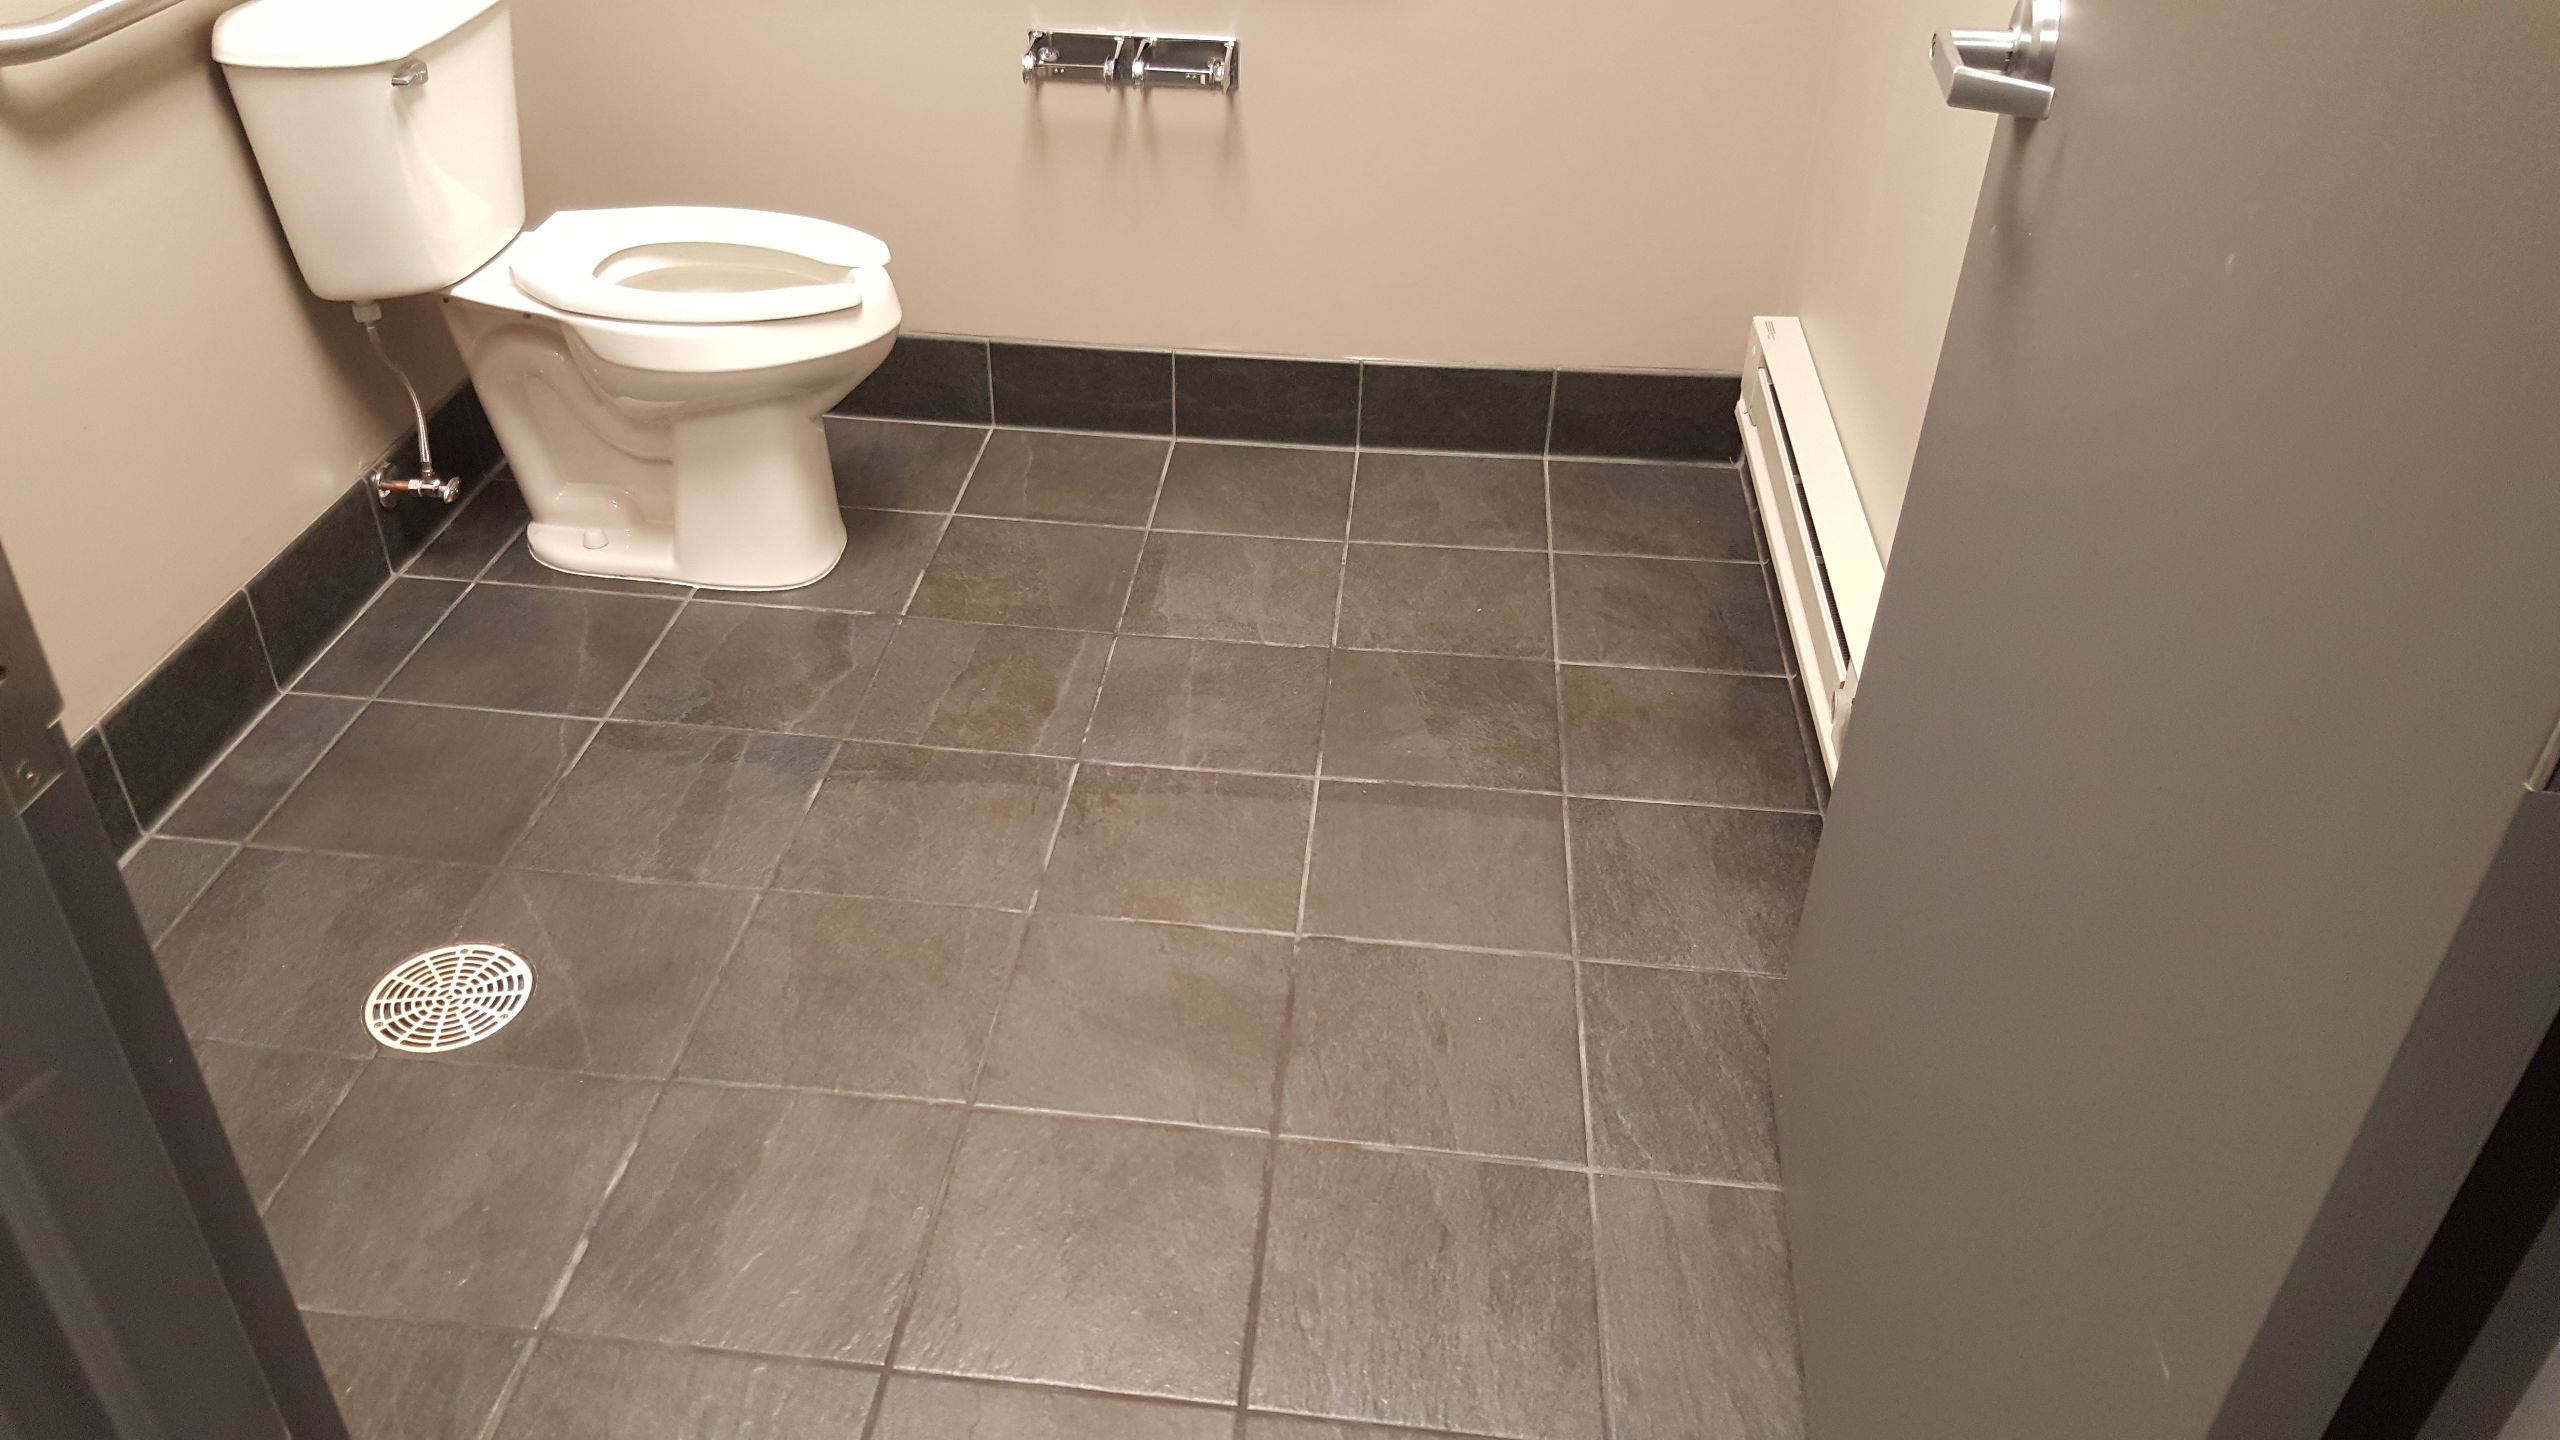 Tile Cleaning in Novi Michigan